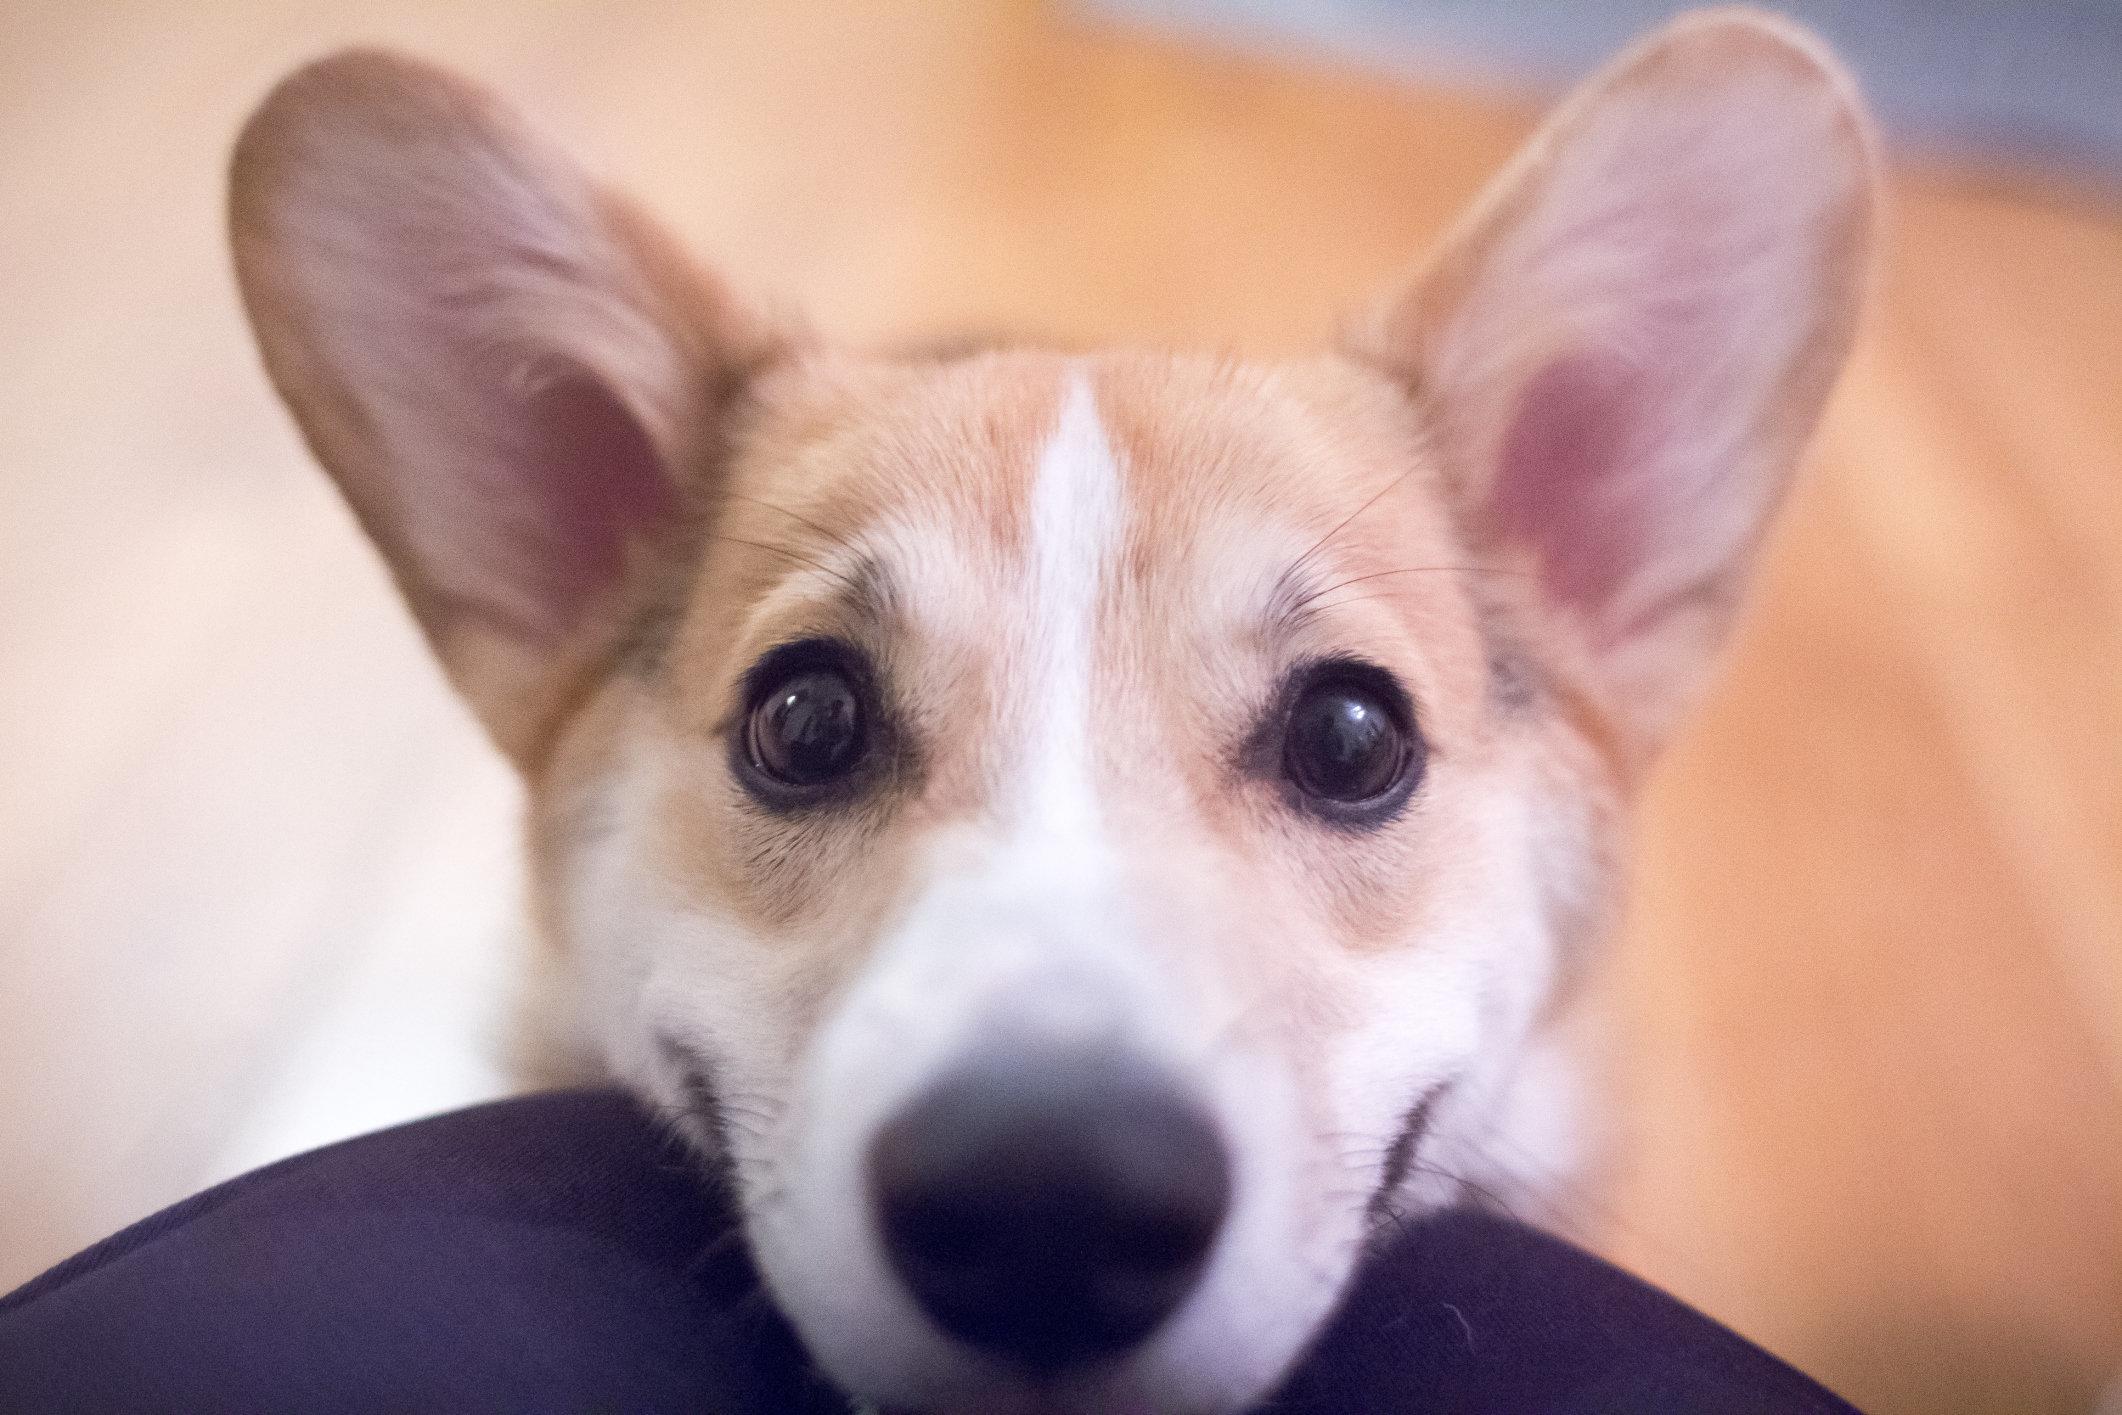 Pembroke Welsh Corgi puppy smiling